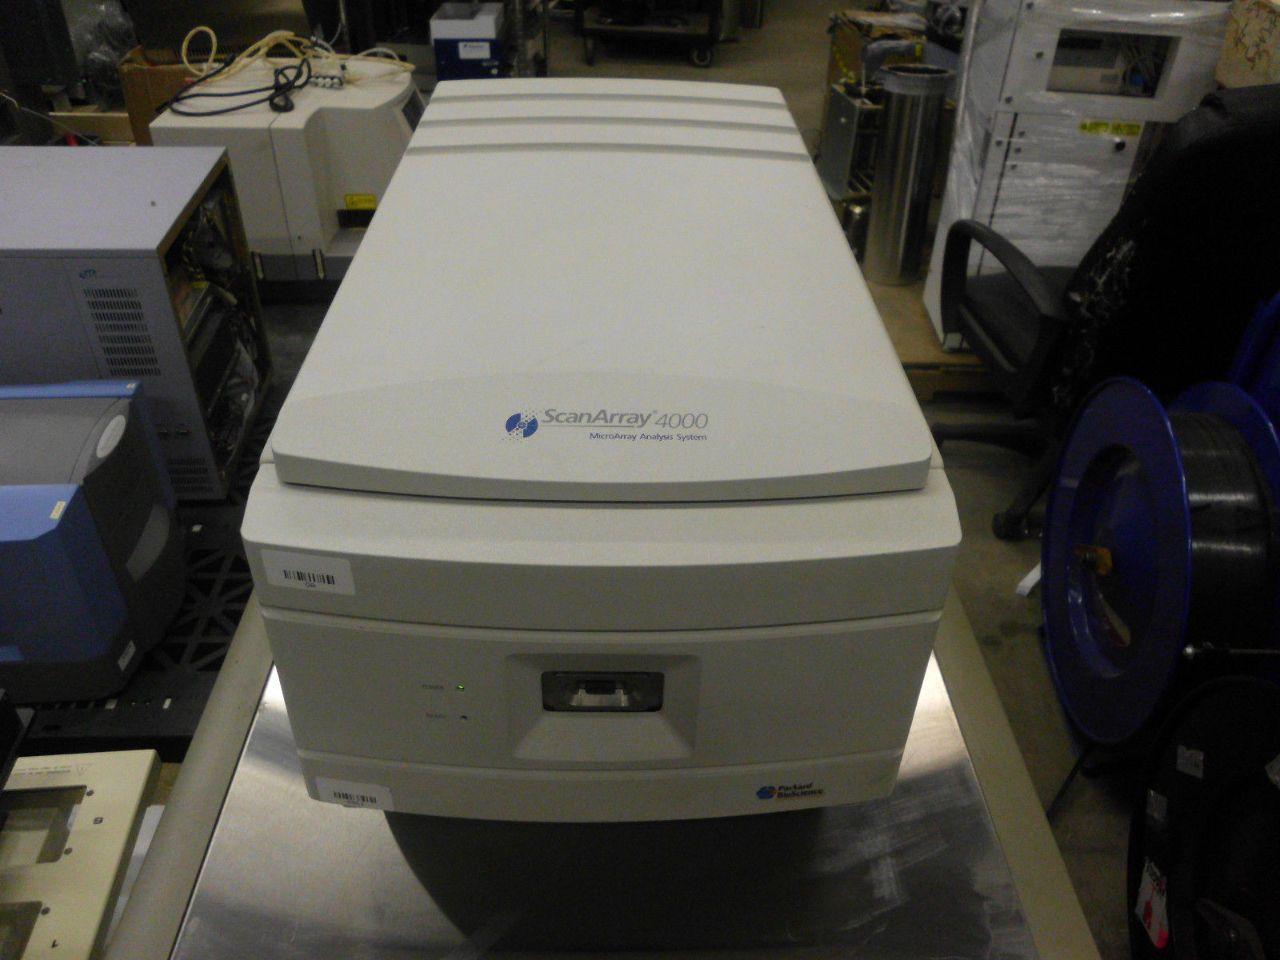 Pin Packard Scanarray Microarrayyzer